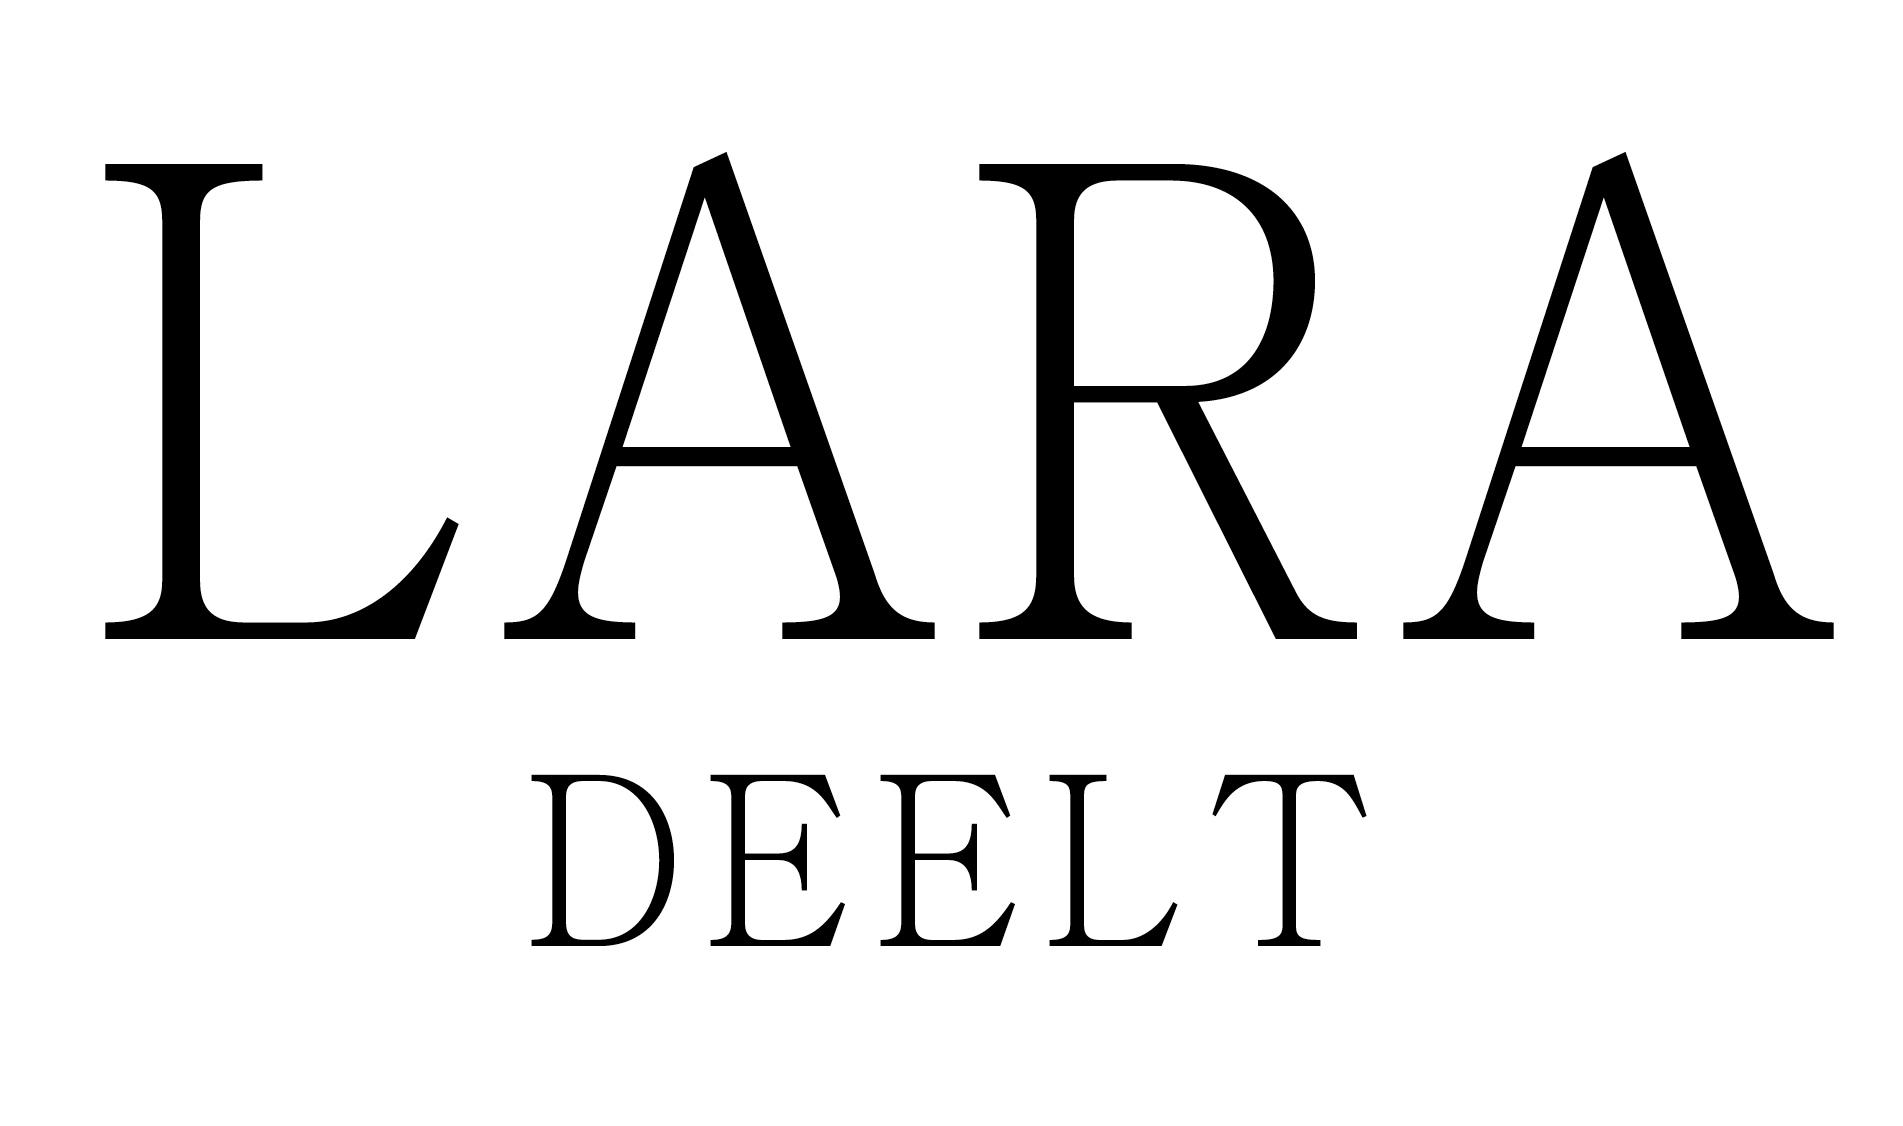 Lara deelt